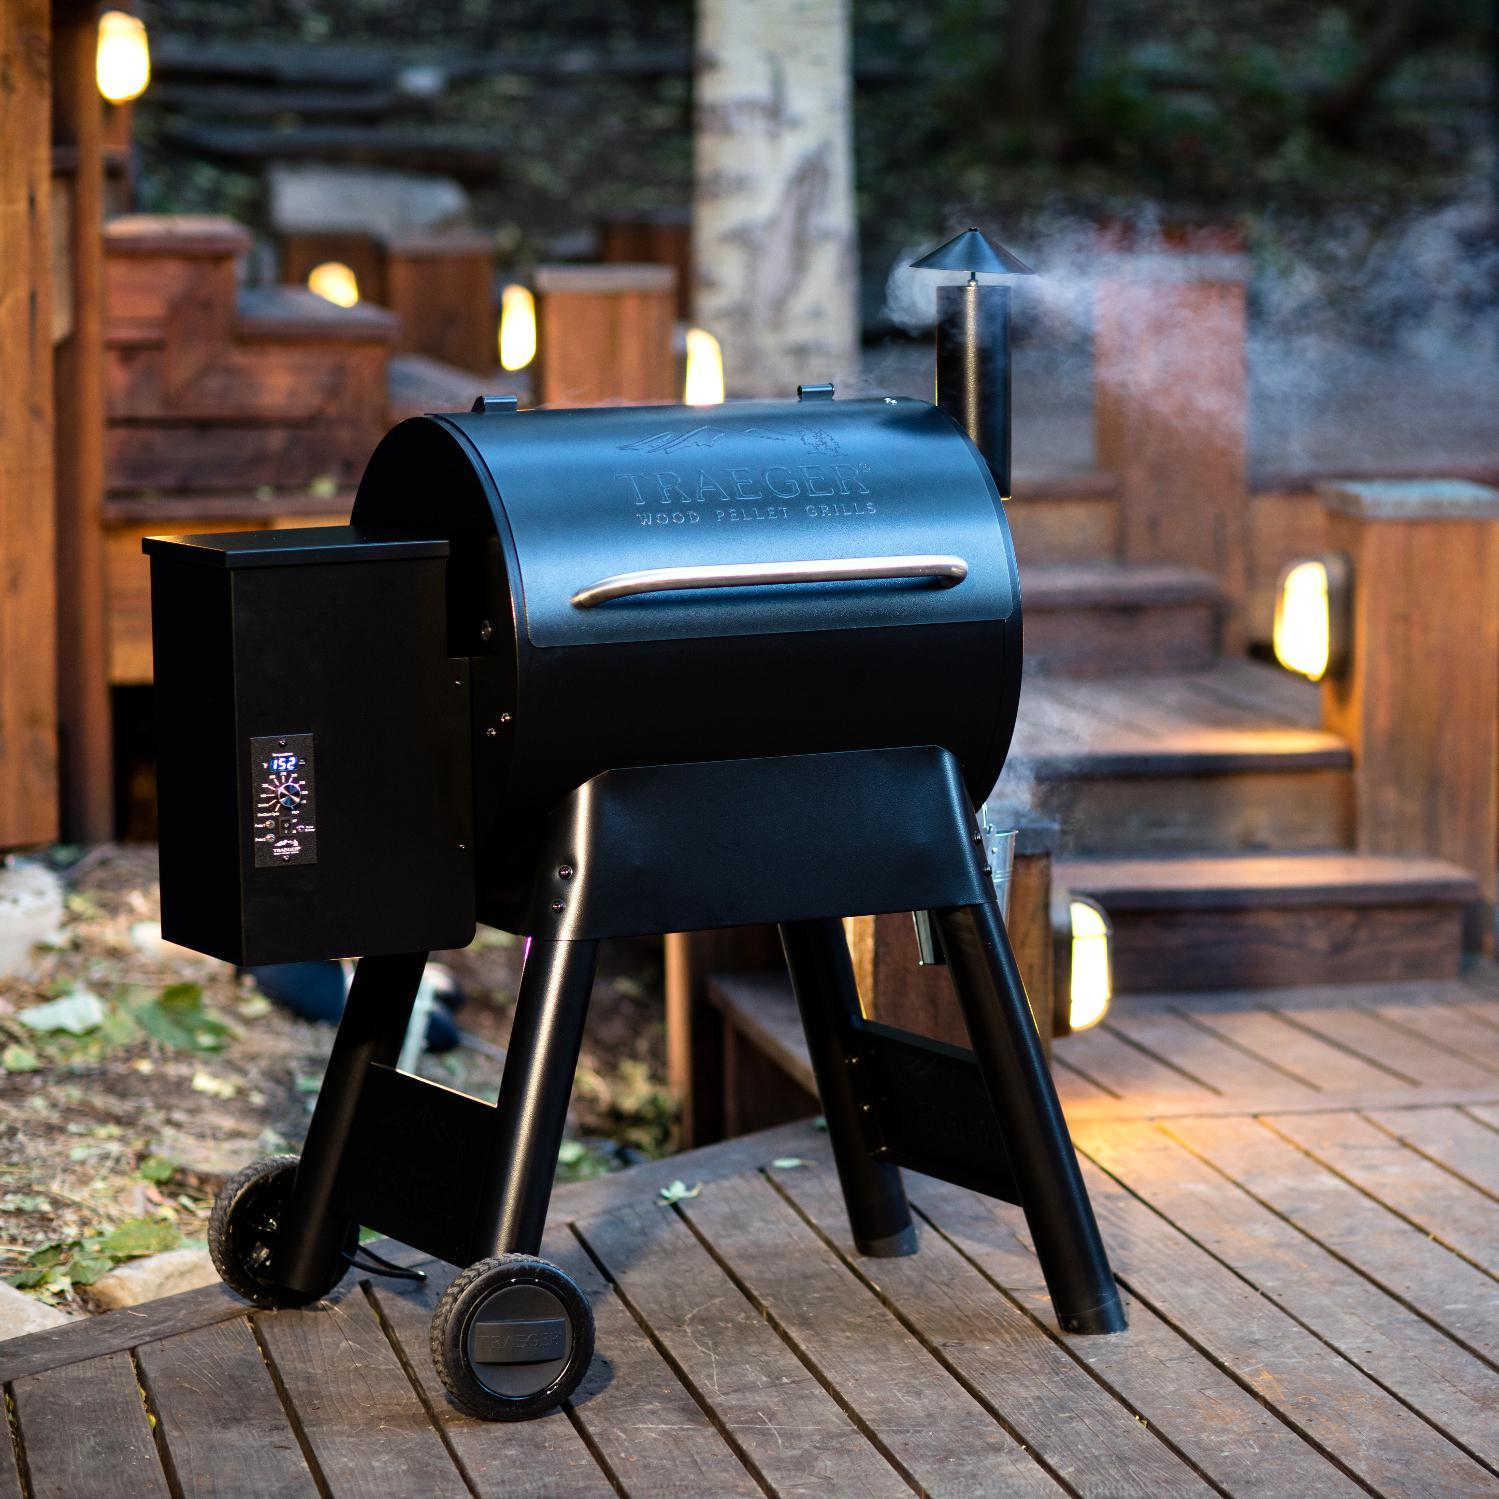 Traeger Pro 22 Pellet Grill Review